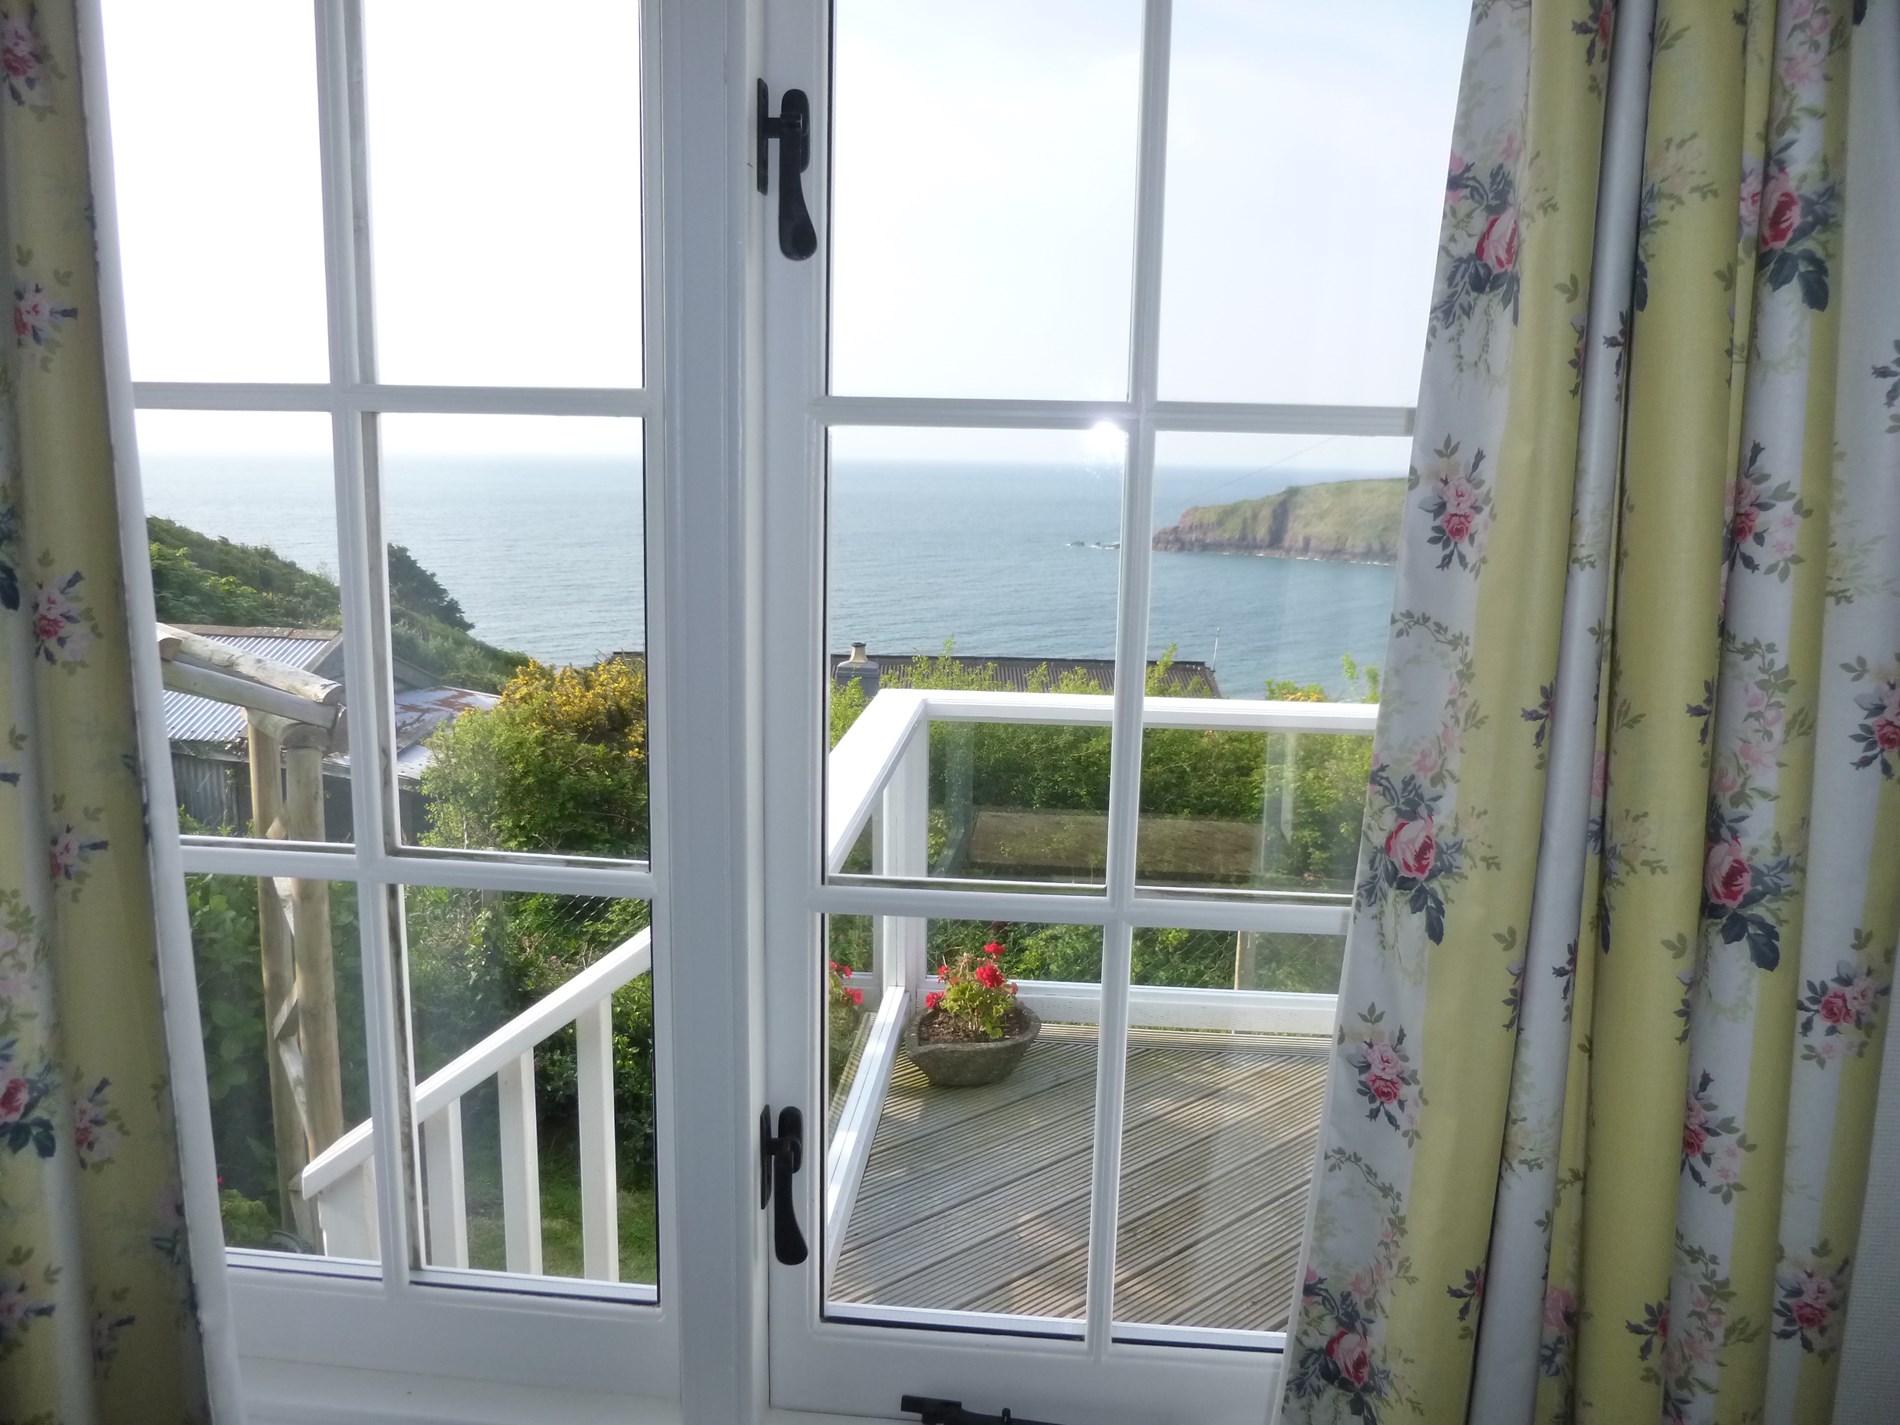 3 Bedroom Cottage in Pembroke, Mid Wales